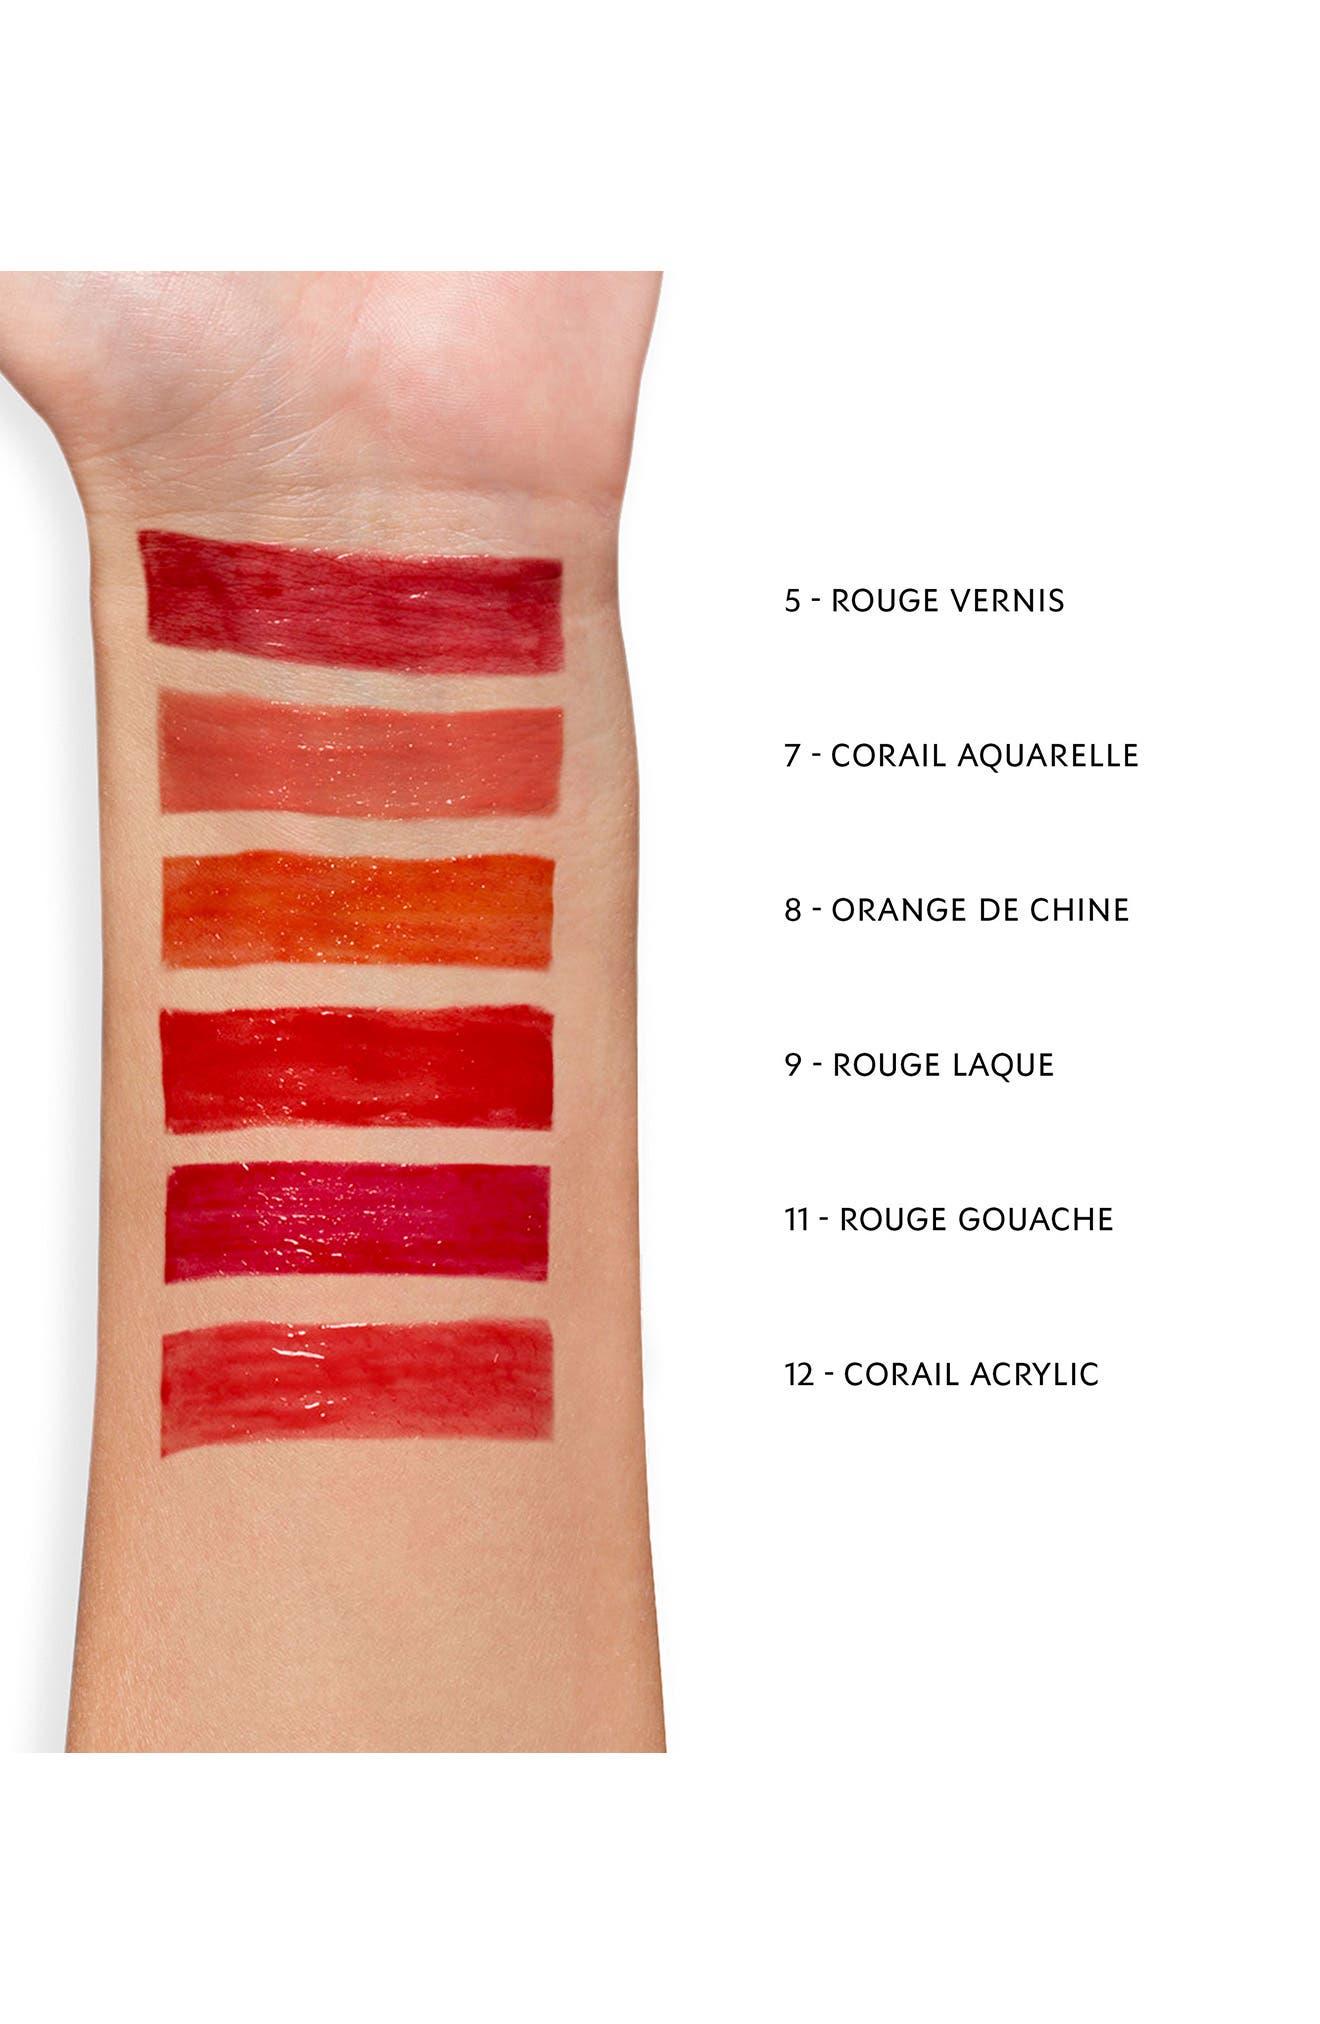 Glossy Stain Lip Color,                             Alternate thumbnail 2, color,                             07 CORAIL AQUATIQUE